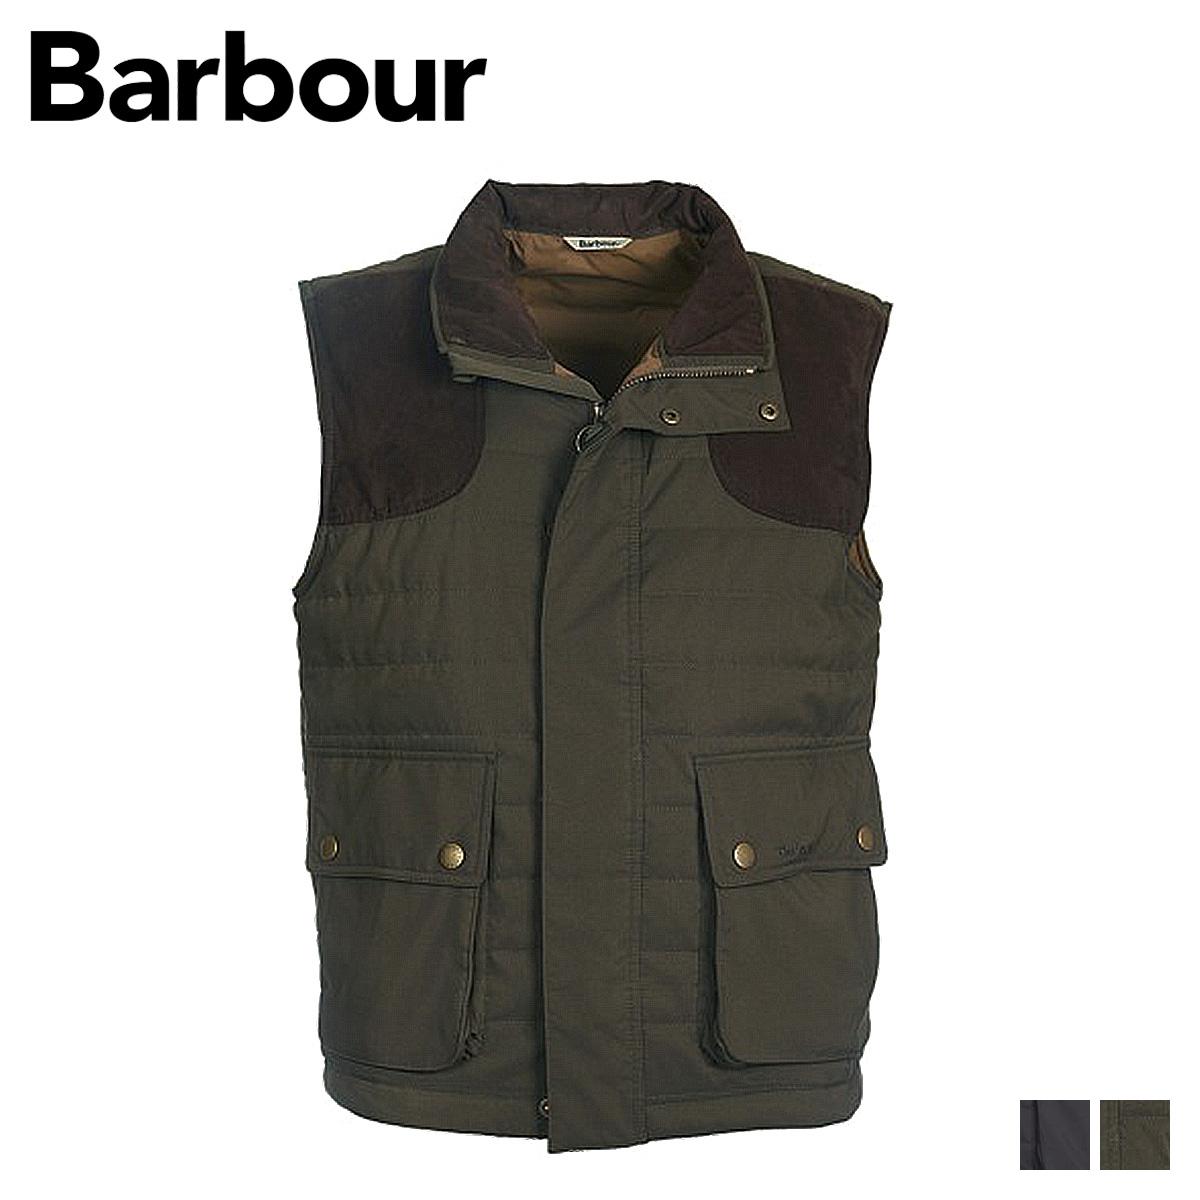 Barbour バブアー ジャケット キルトジャケット BARBOUR AVOCET QUILT JAKECT メンズ